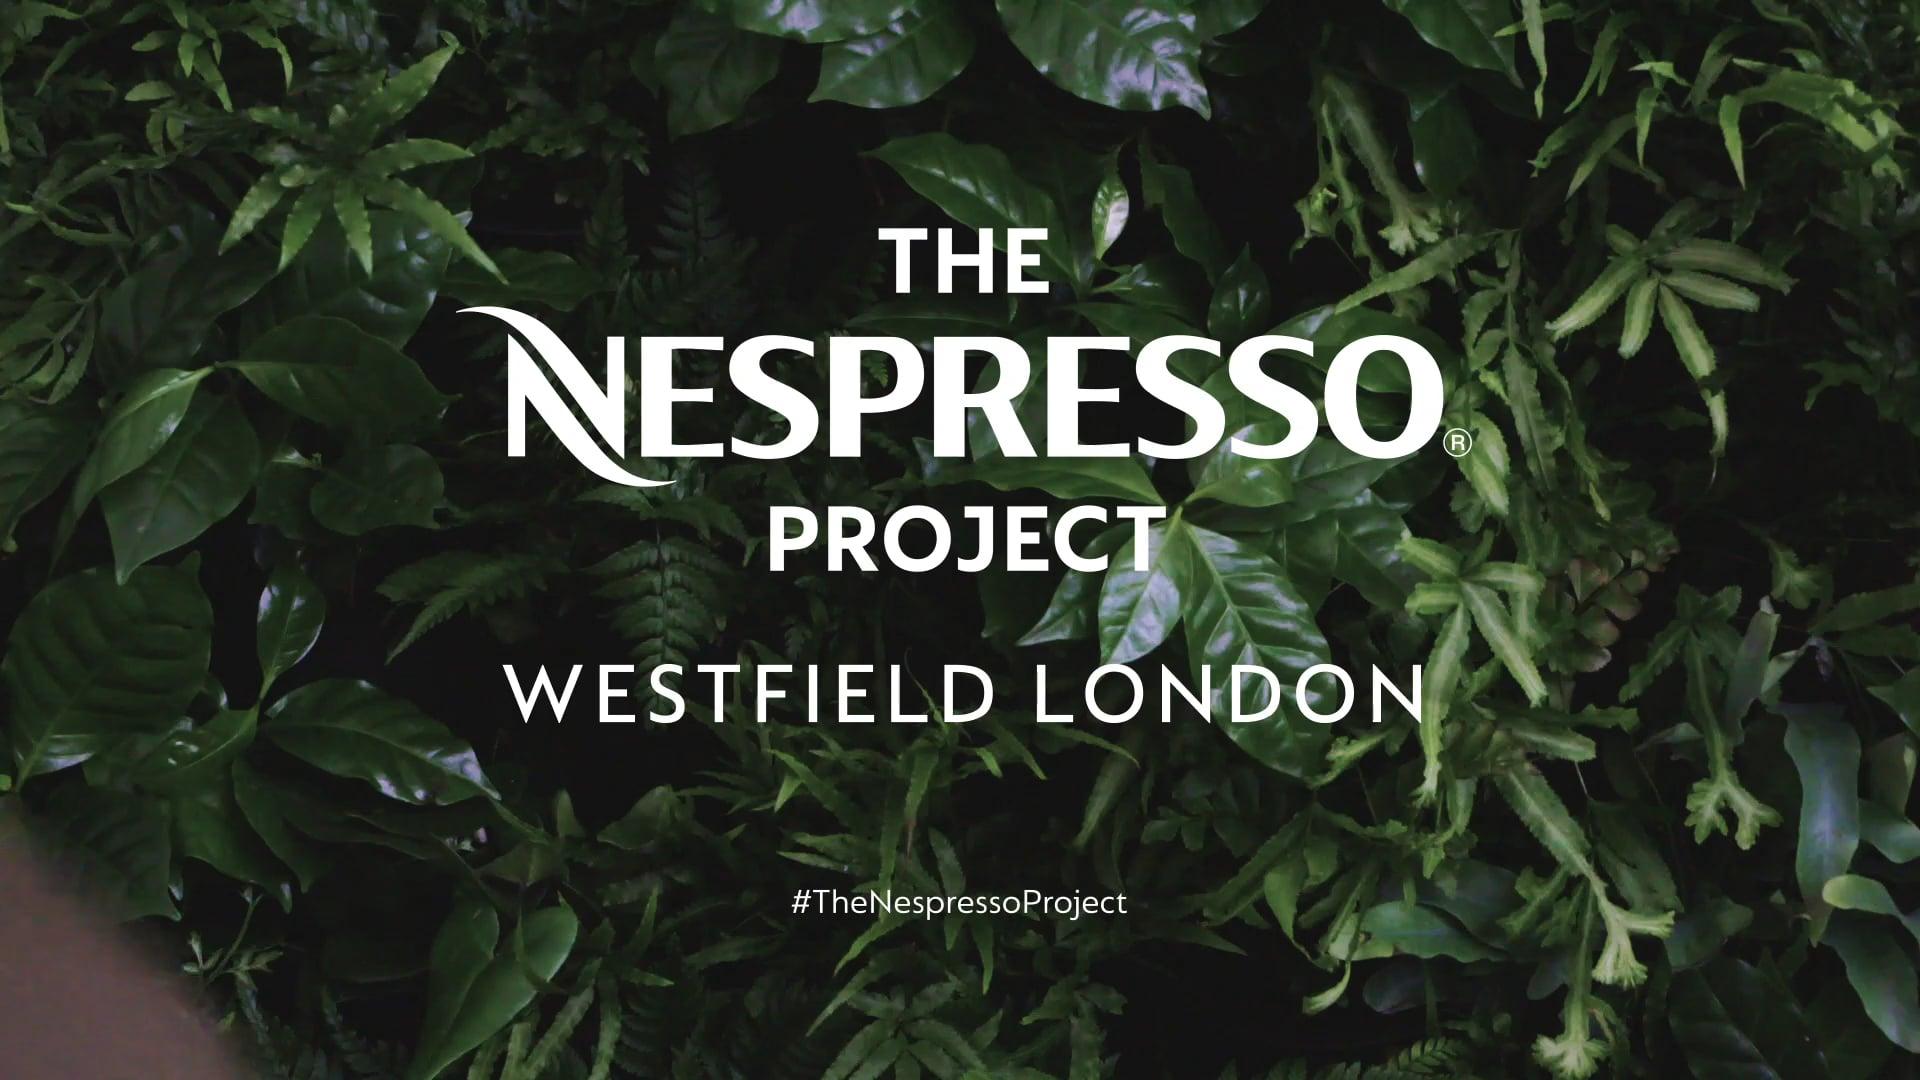 The Nespresso Project